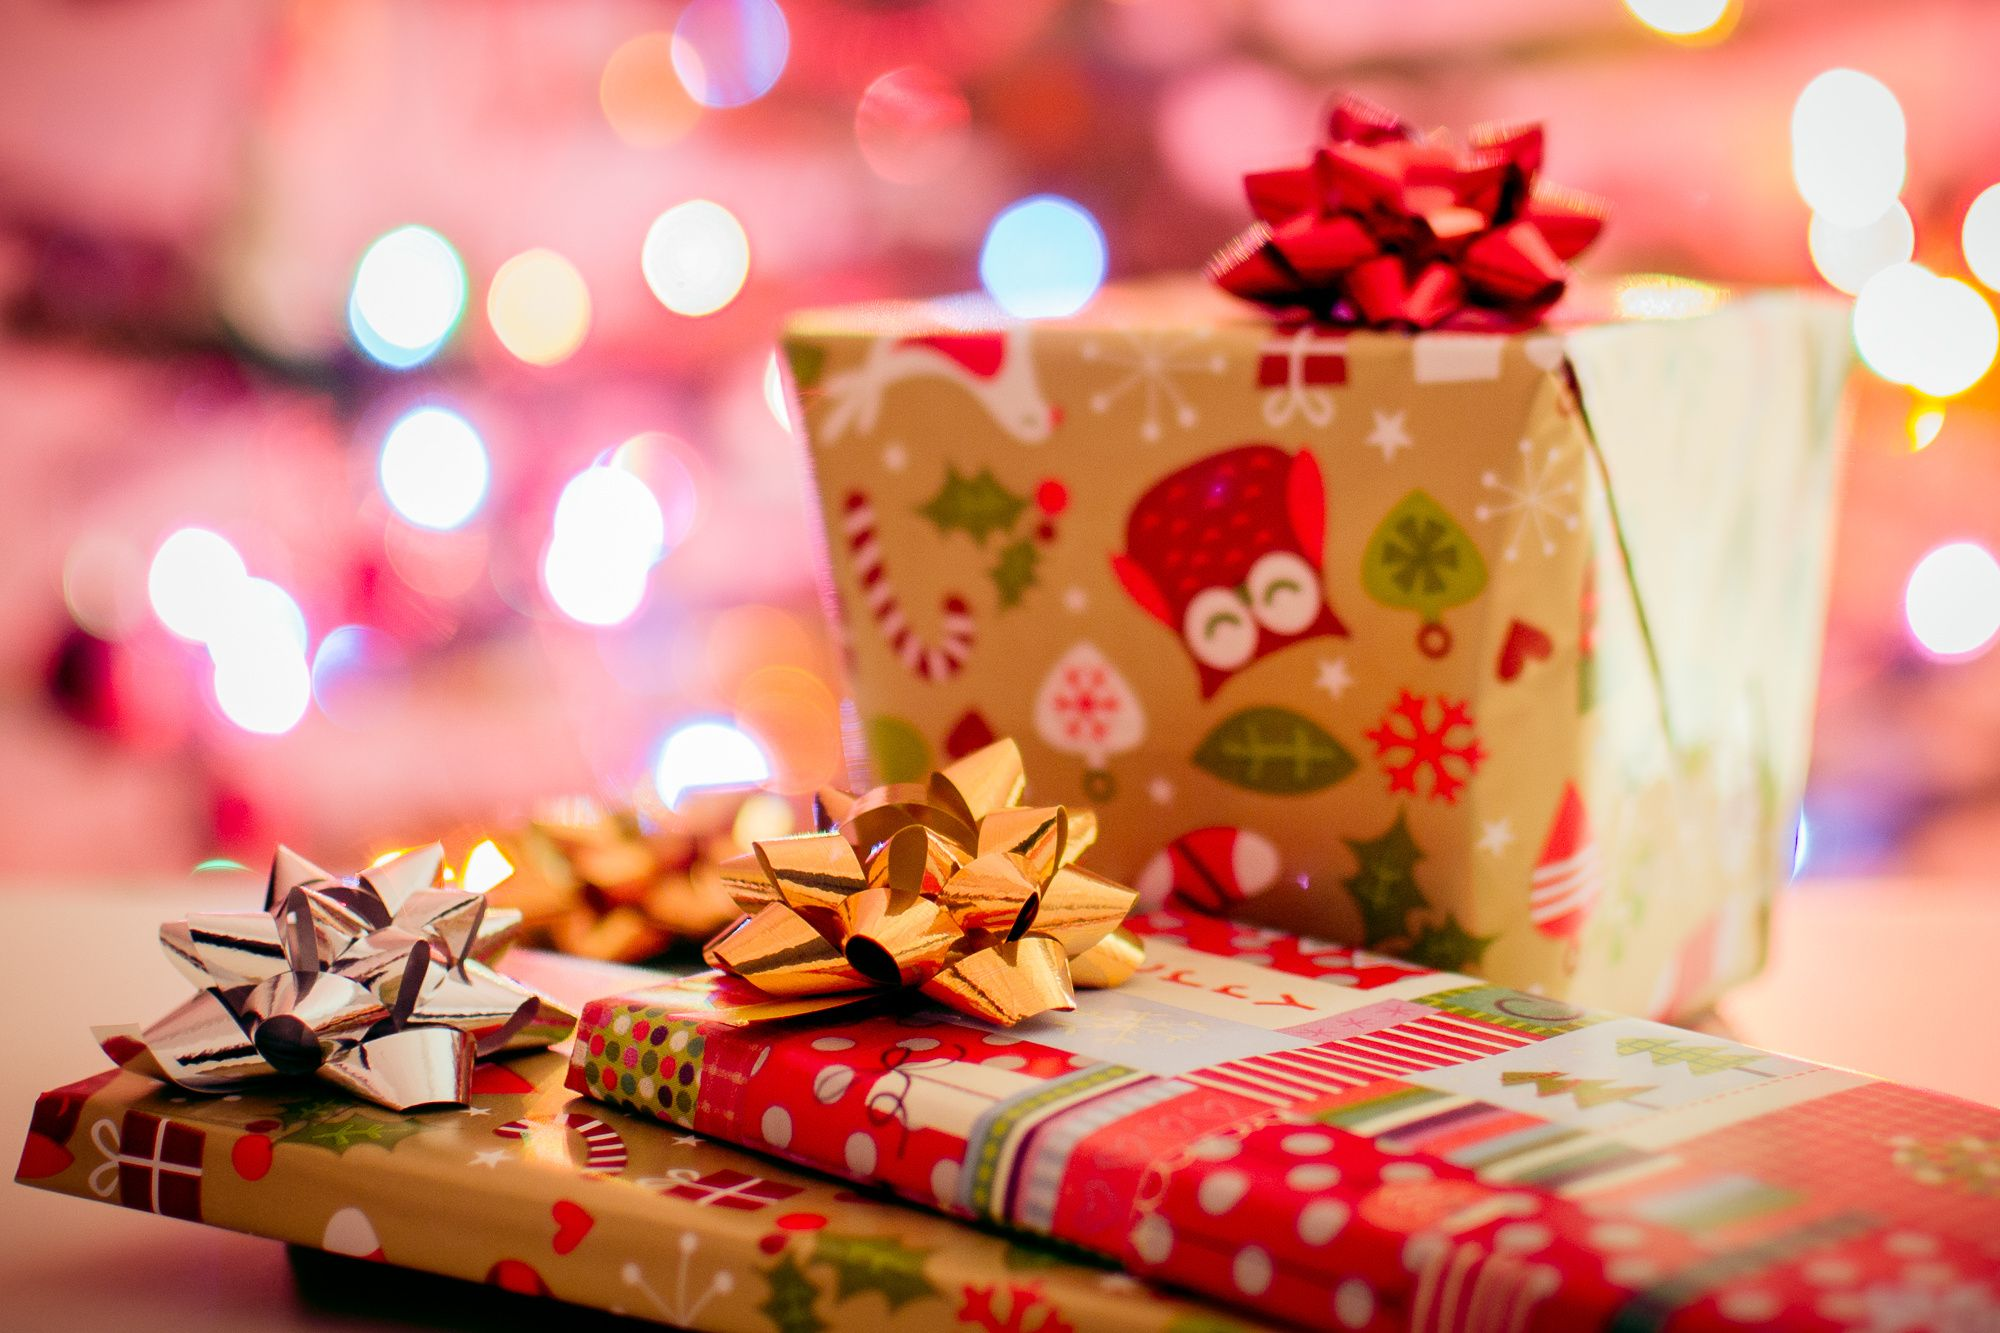 THE ULTIMATE HOLIDAY WISH LIST FOR THE TRAVELING KID #holidaywishlist #travelingkid #kidpresents #fitkickslife #stockingstuffers #welltraveledchild